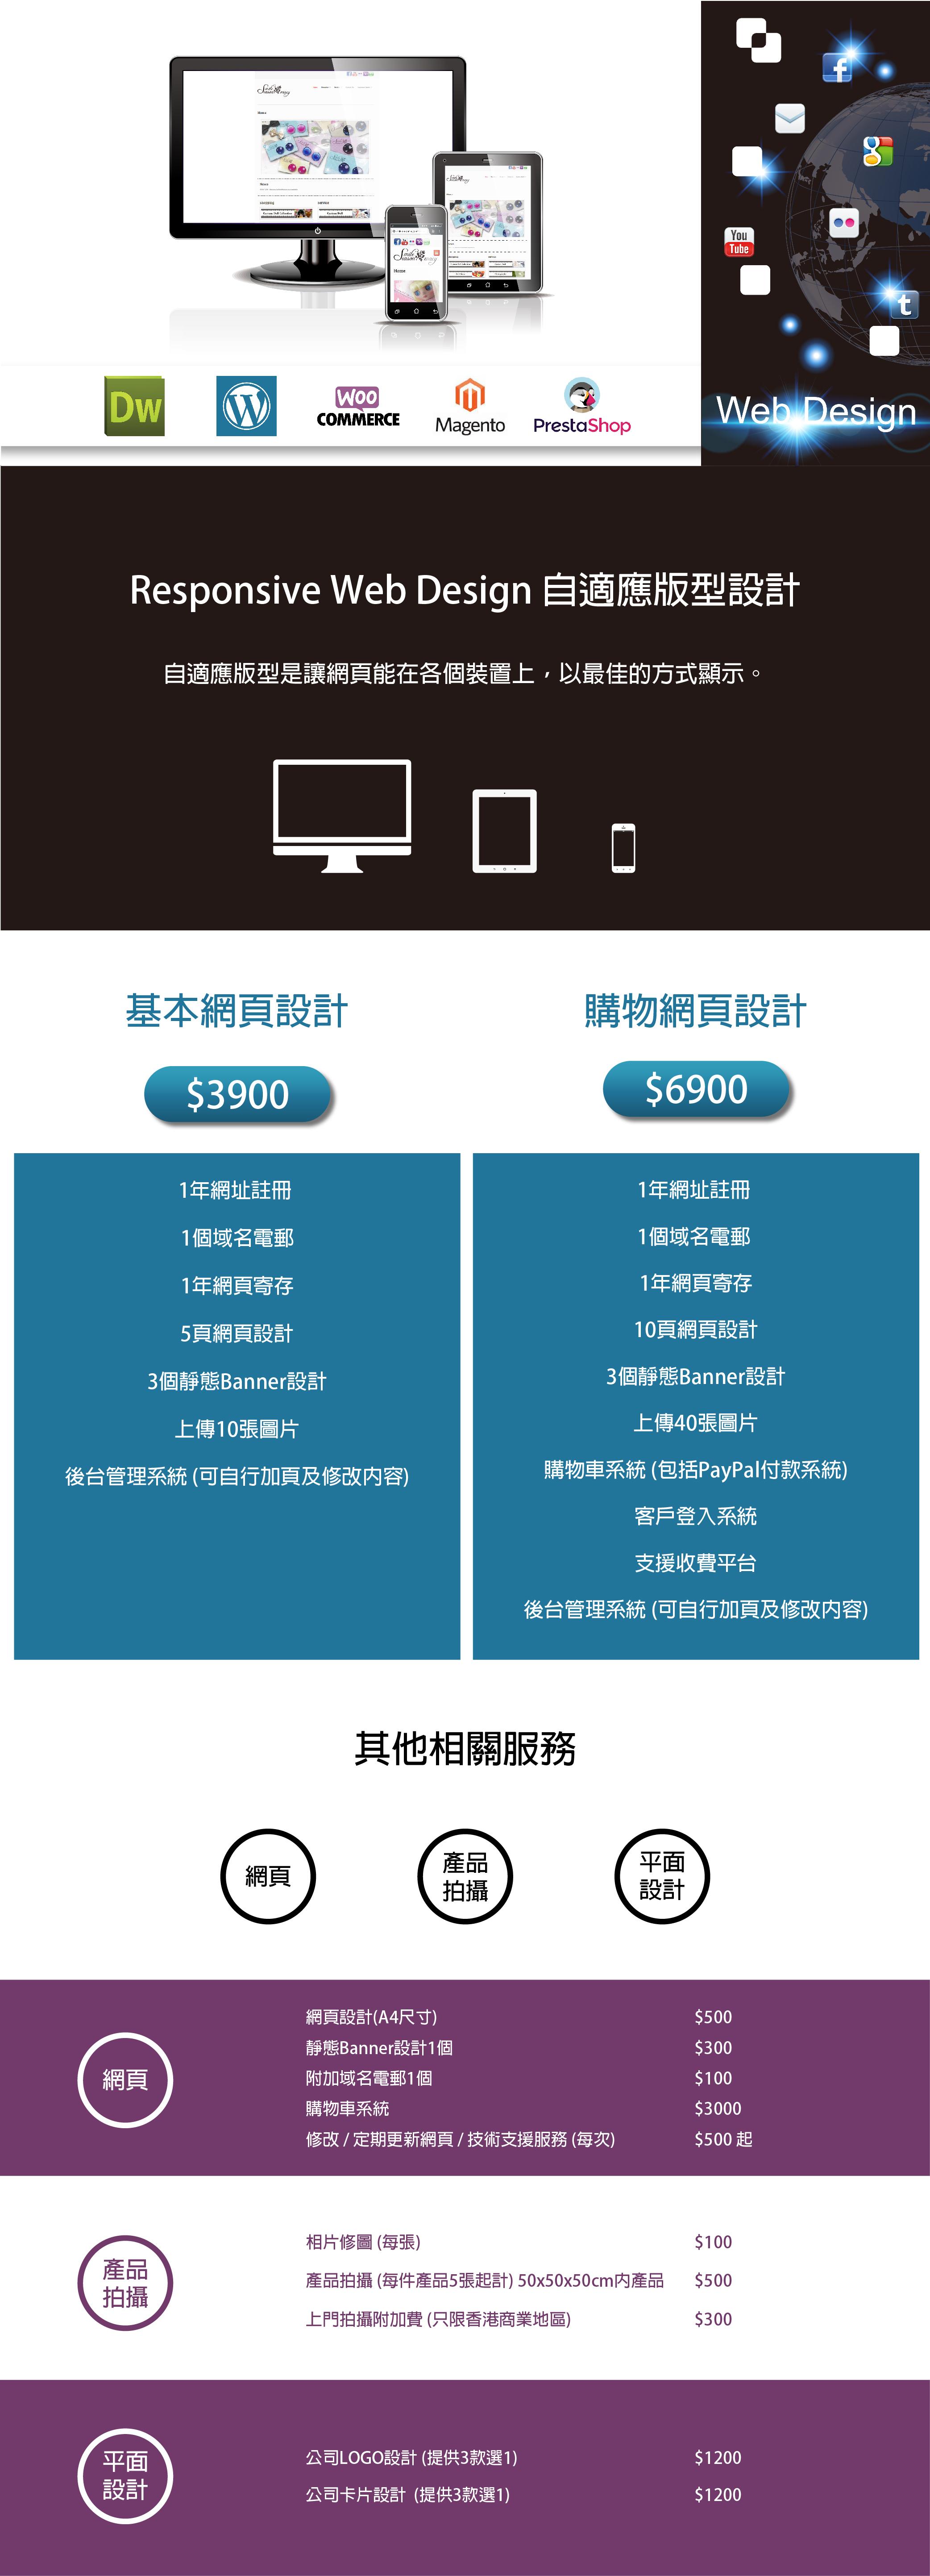 service-web-design-01